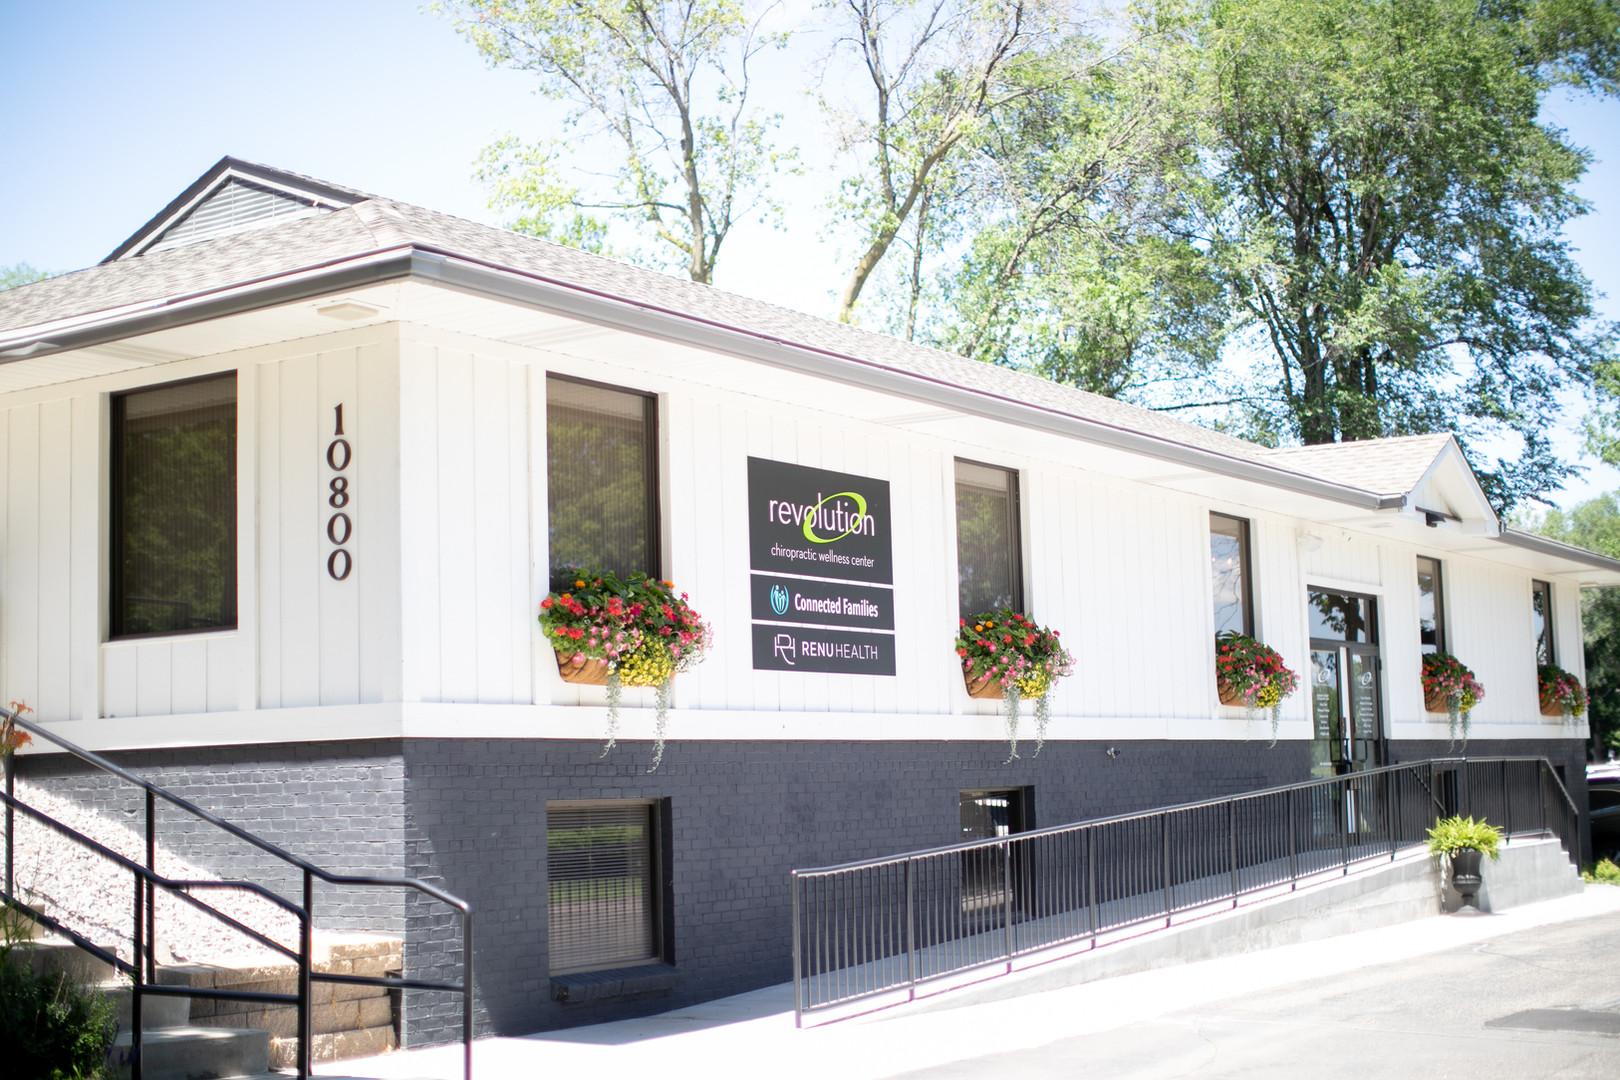 Exterior Clinic 1 July 2020.jpg